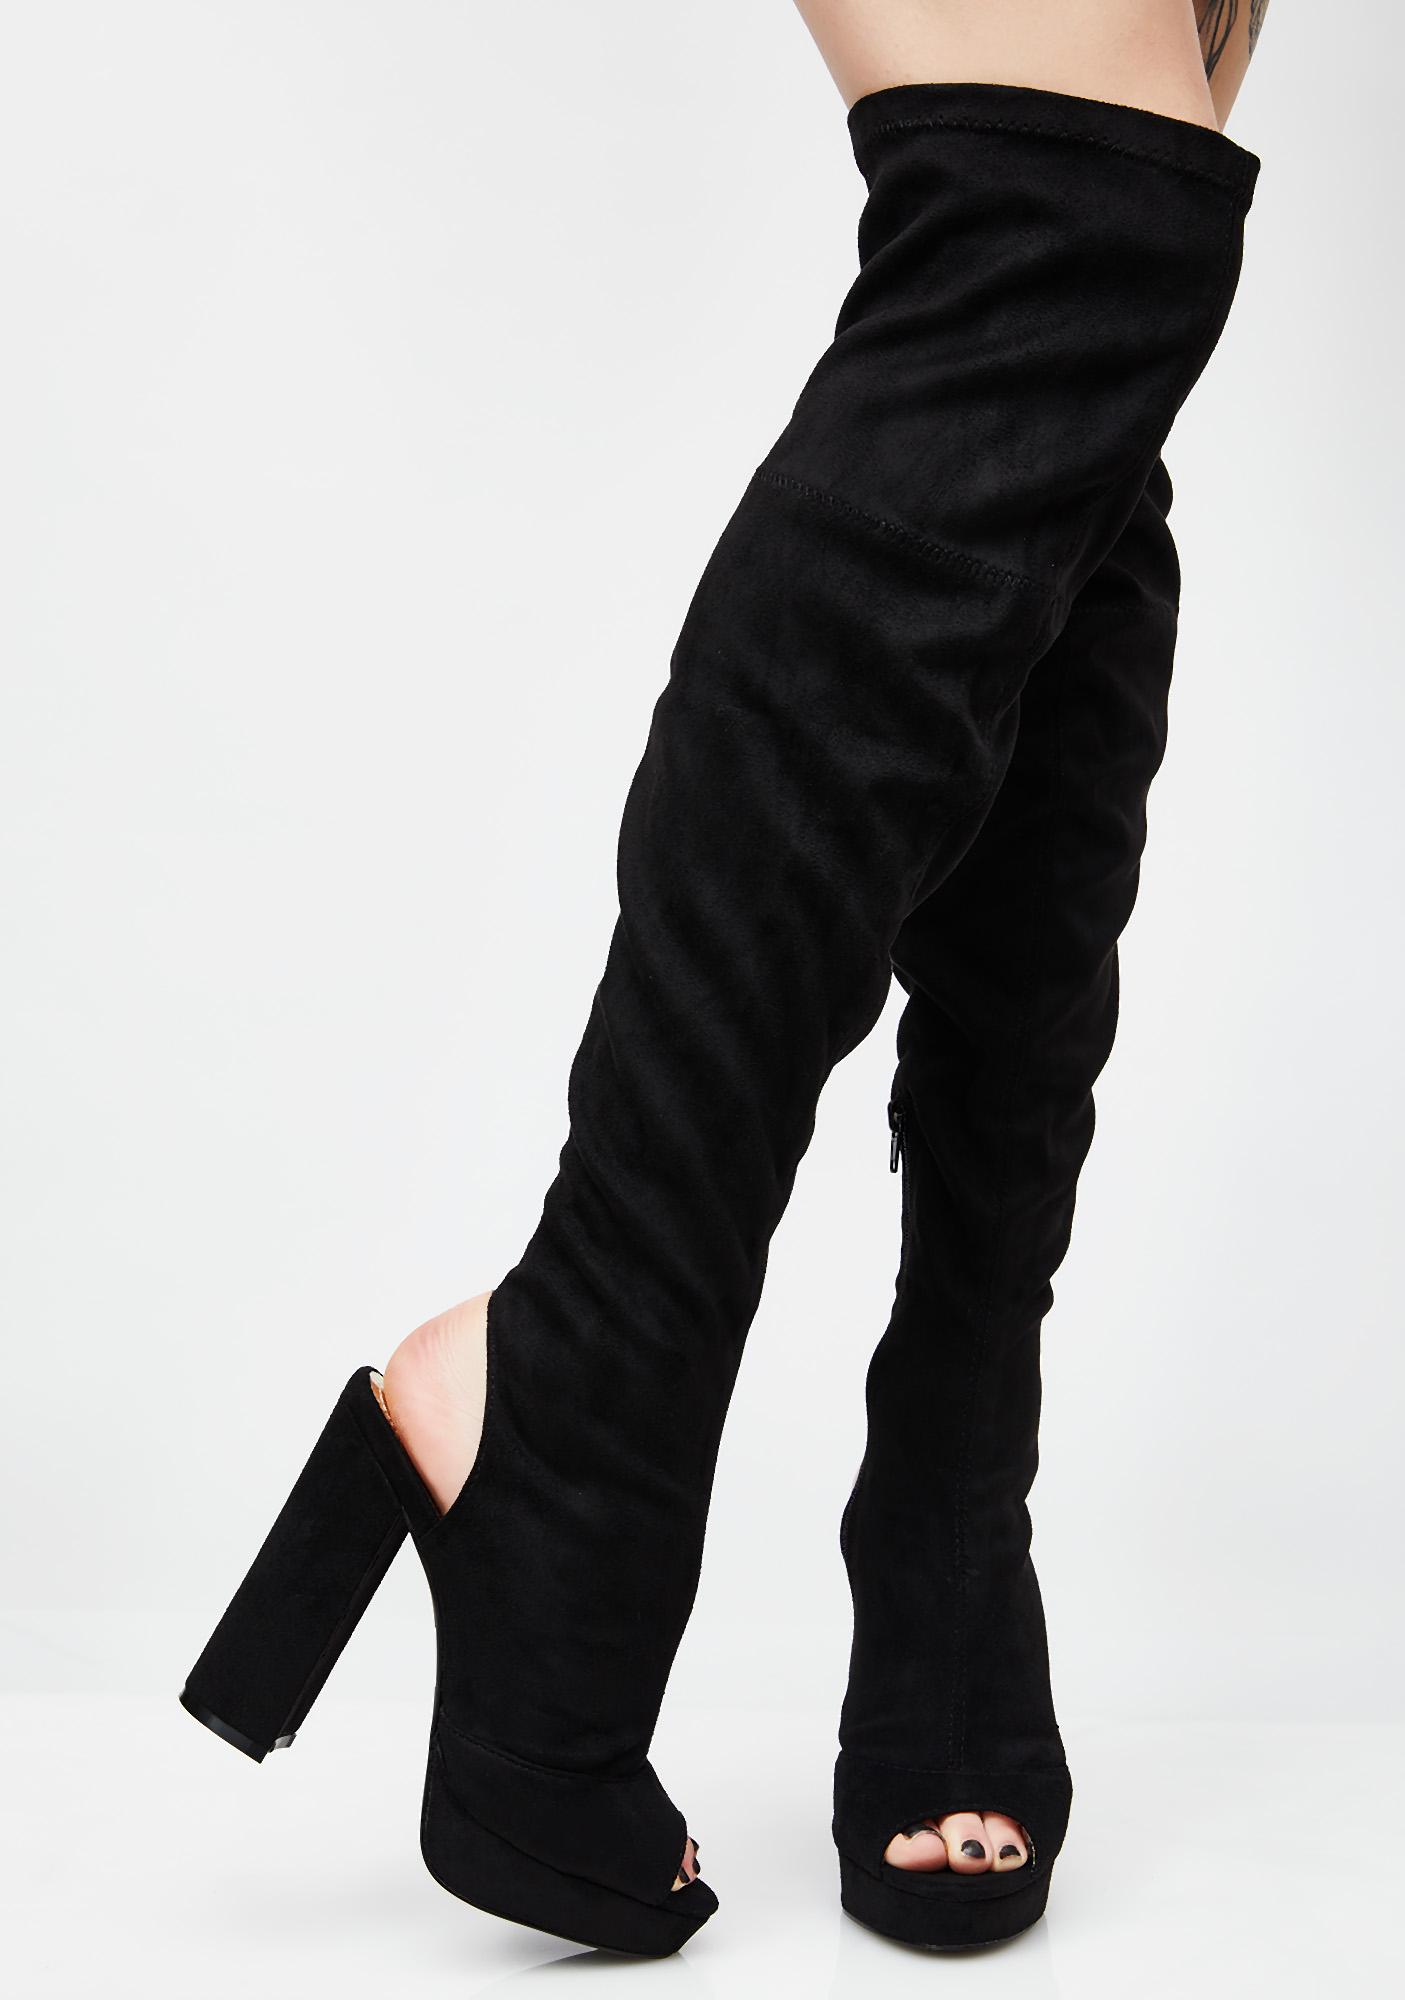 ce71ba46902e Peep Toe Over The Knee Boots | Dolls Kill